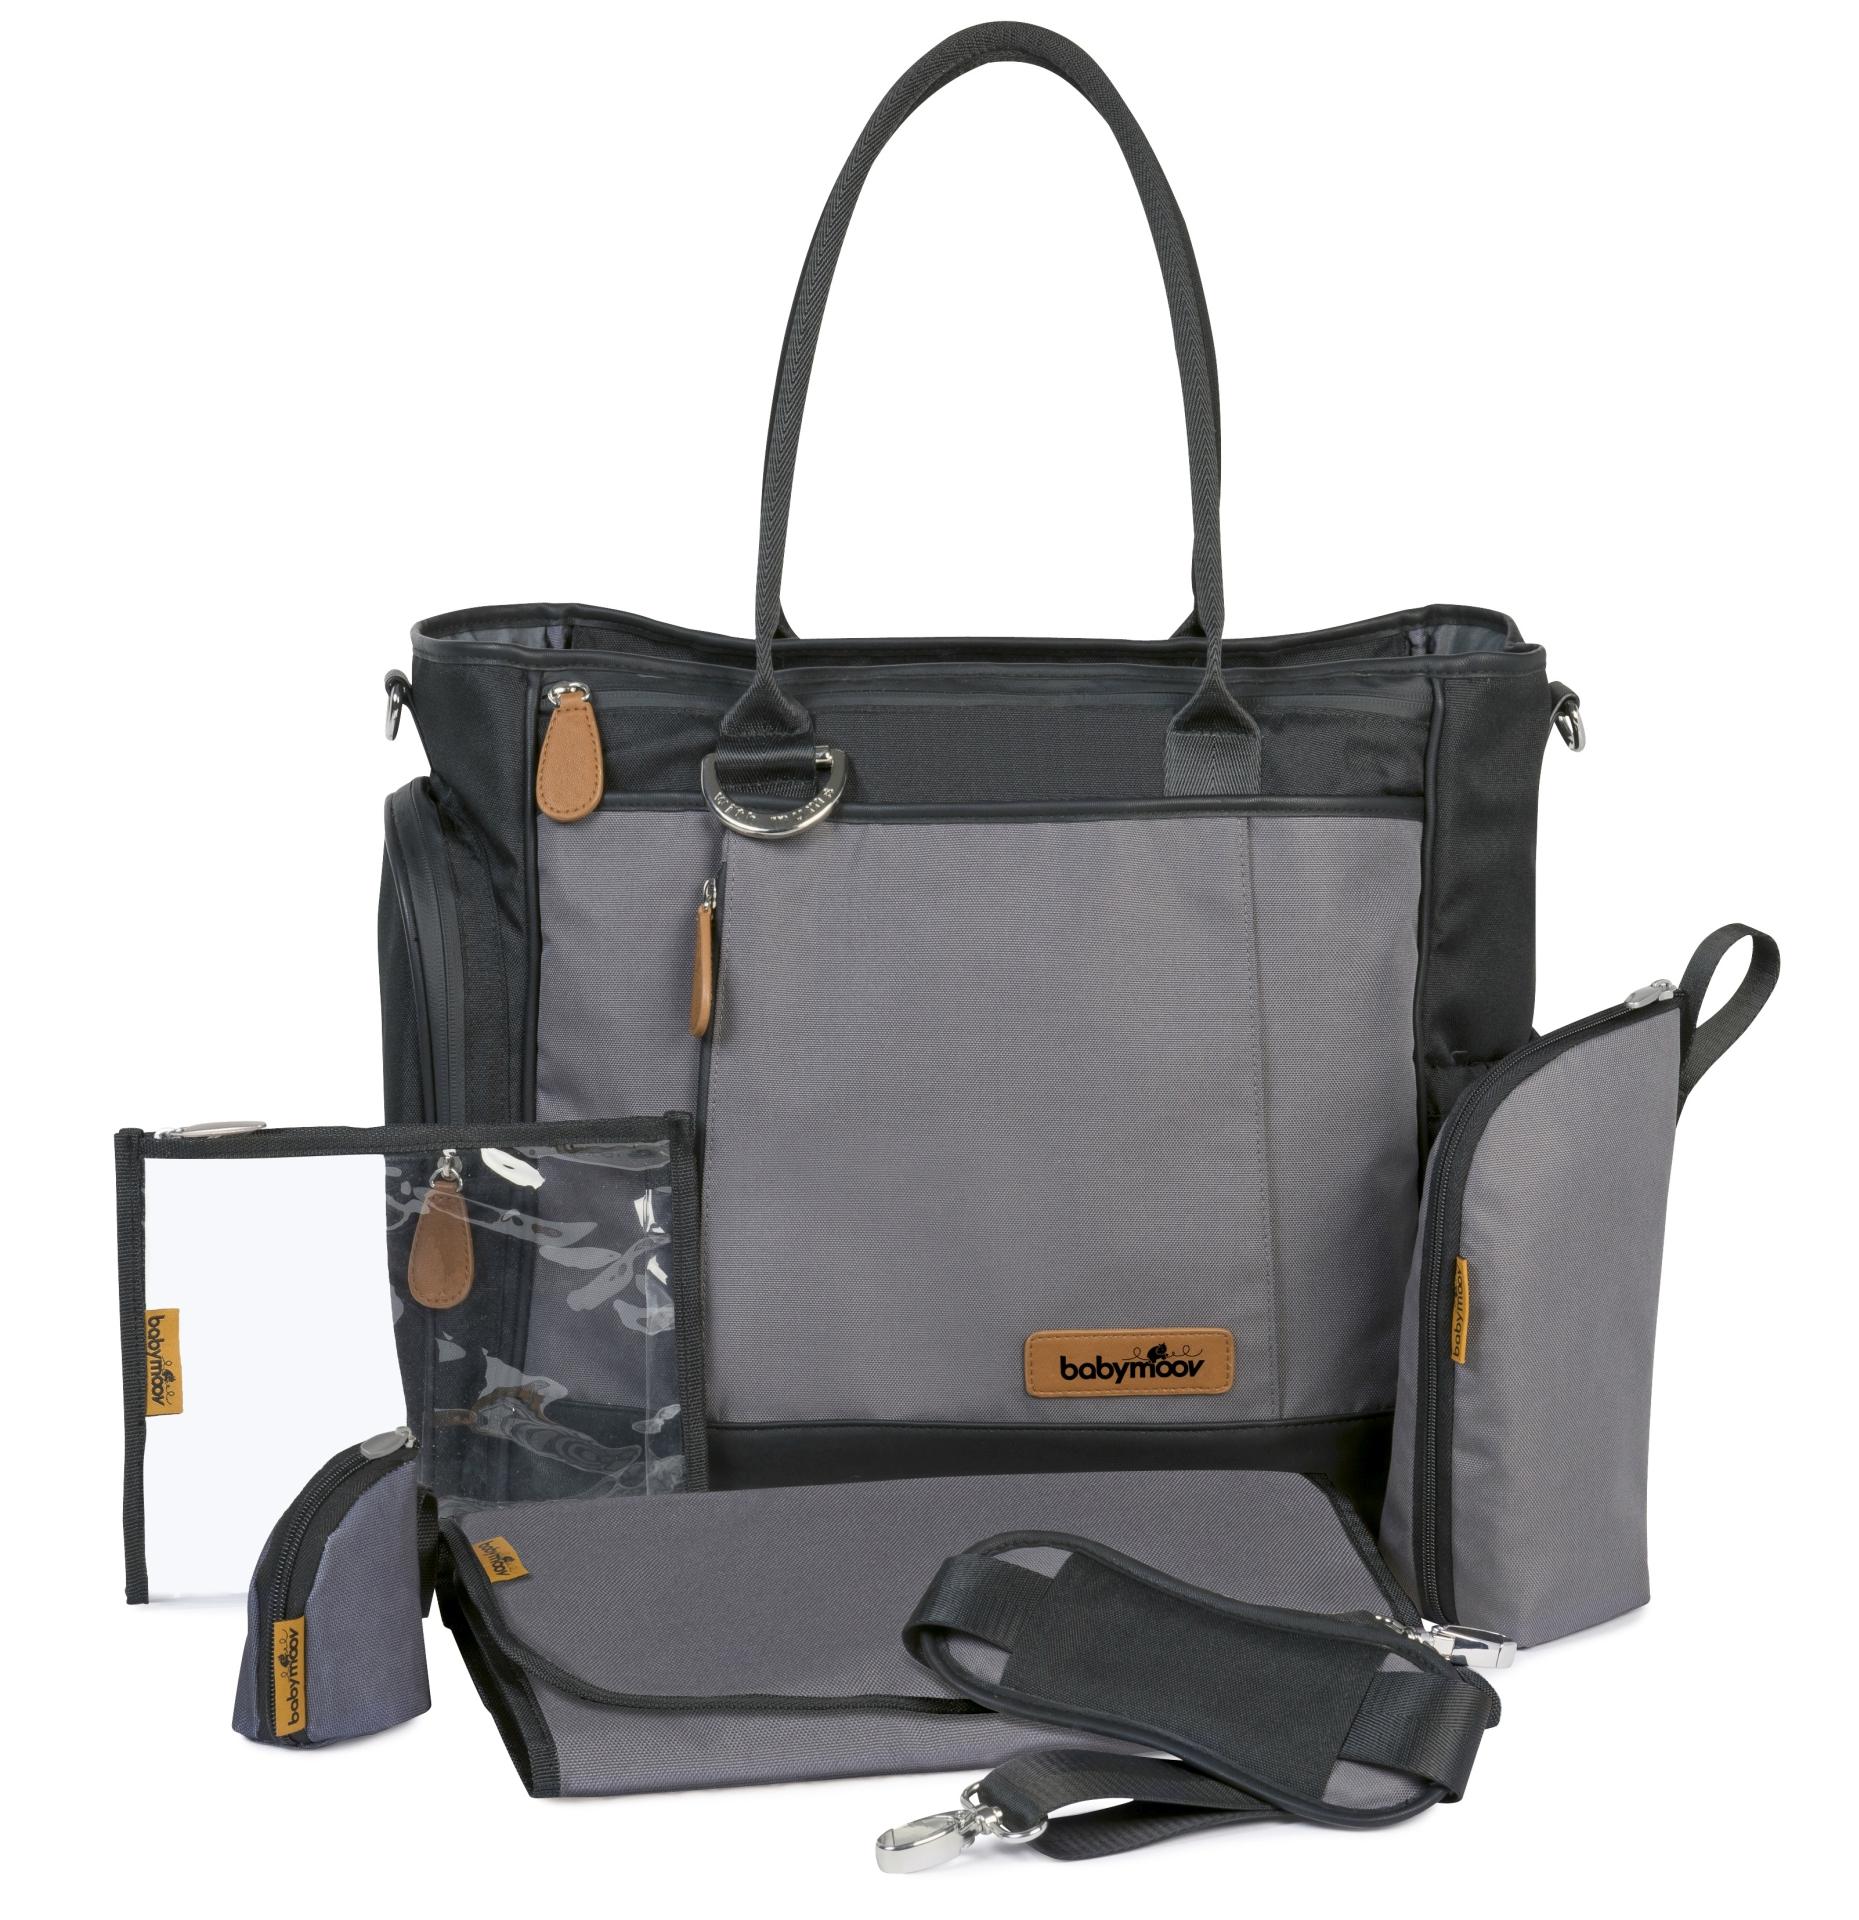 Babymoov Diaper Bag Essential 2017 Large Image 1